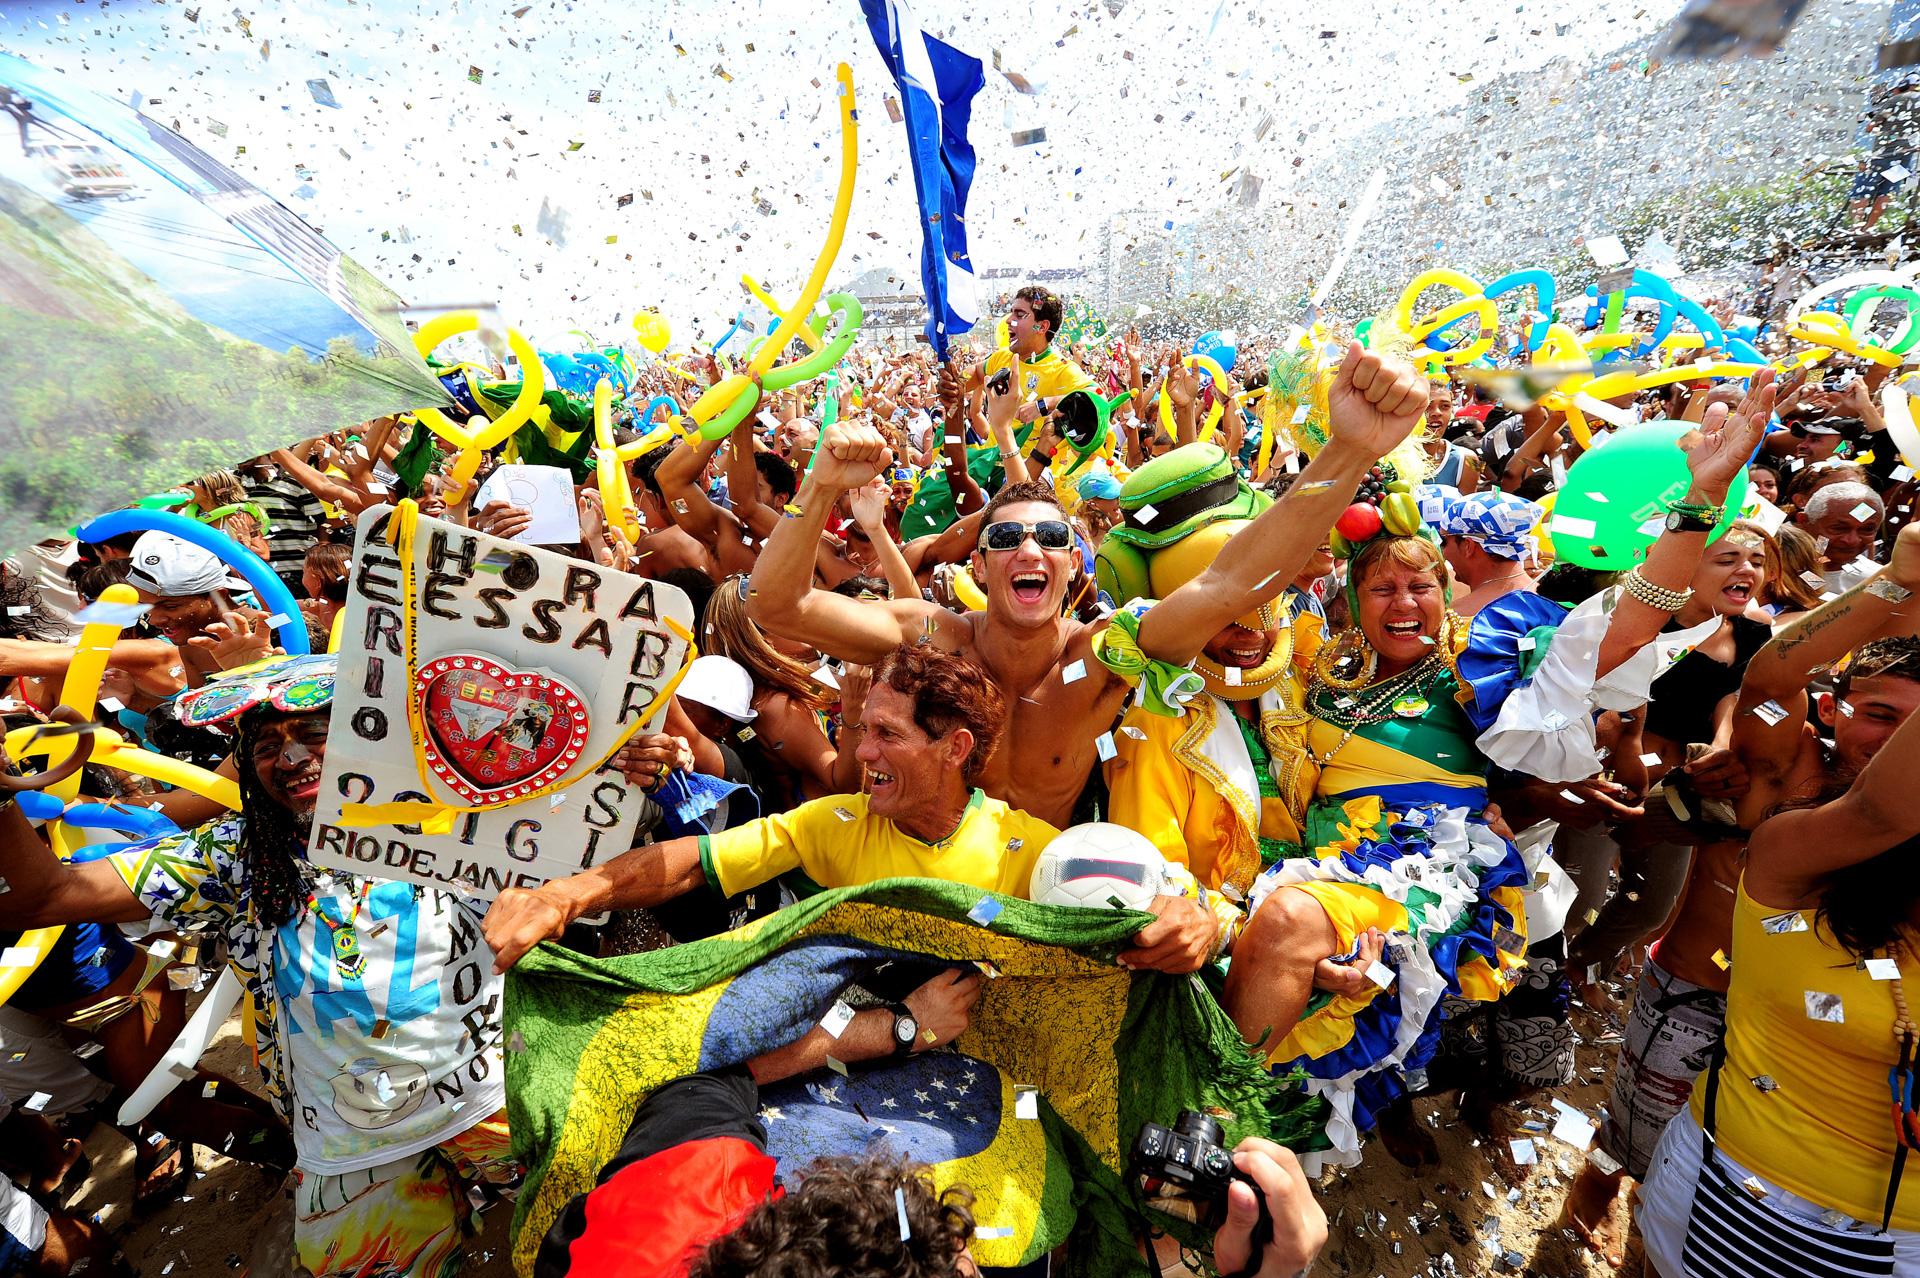 Comemoraçao